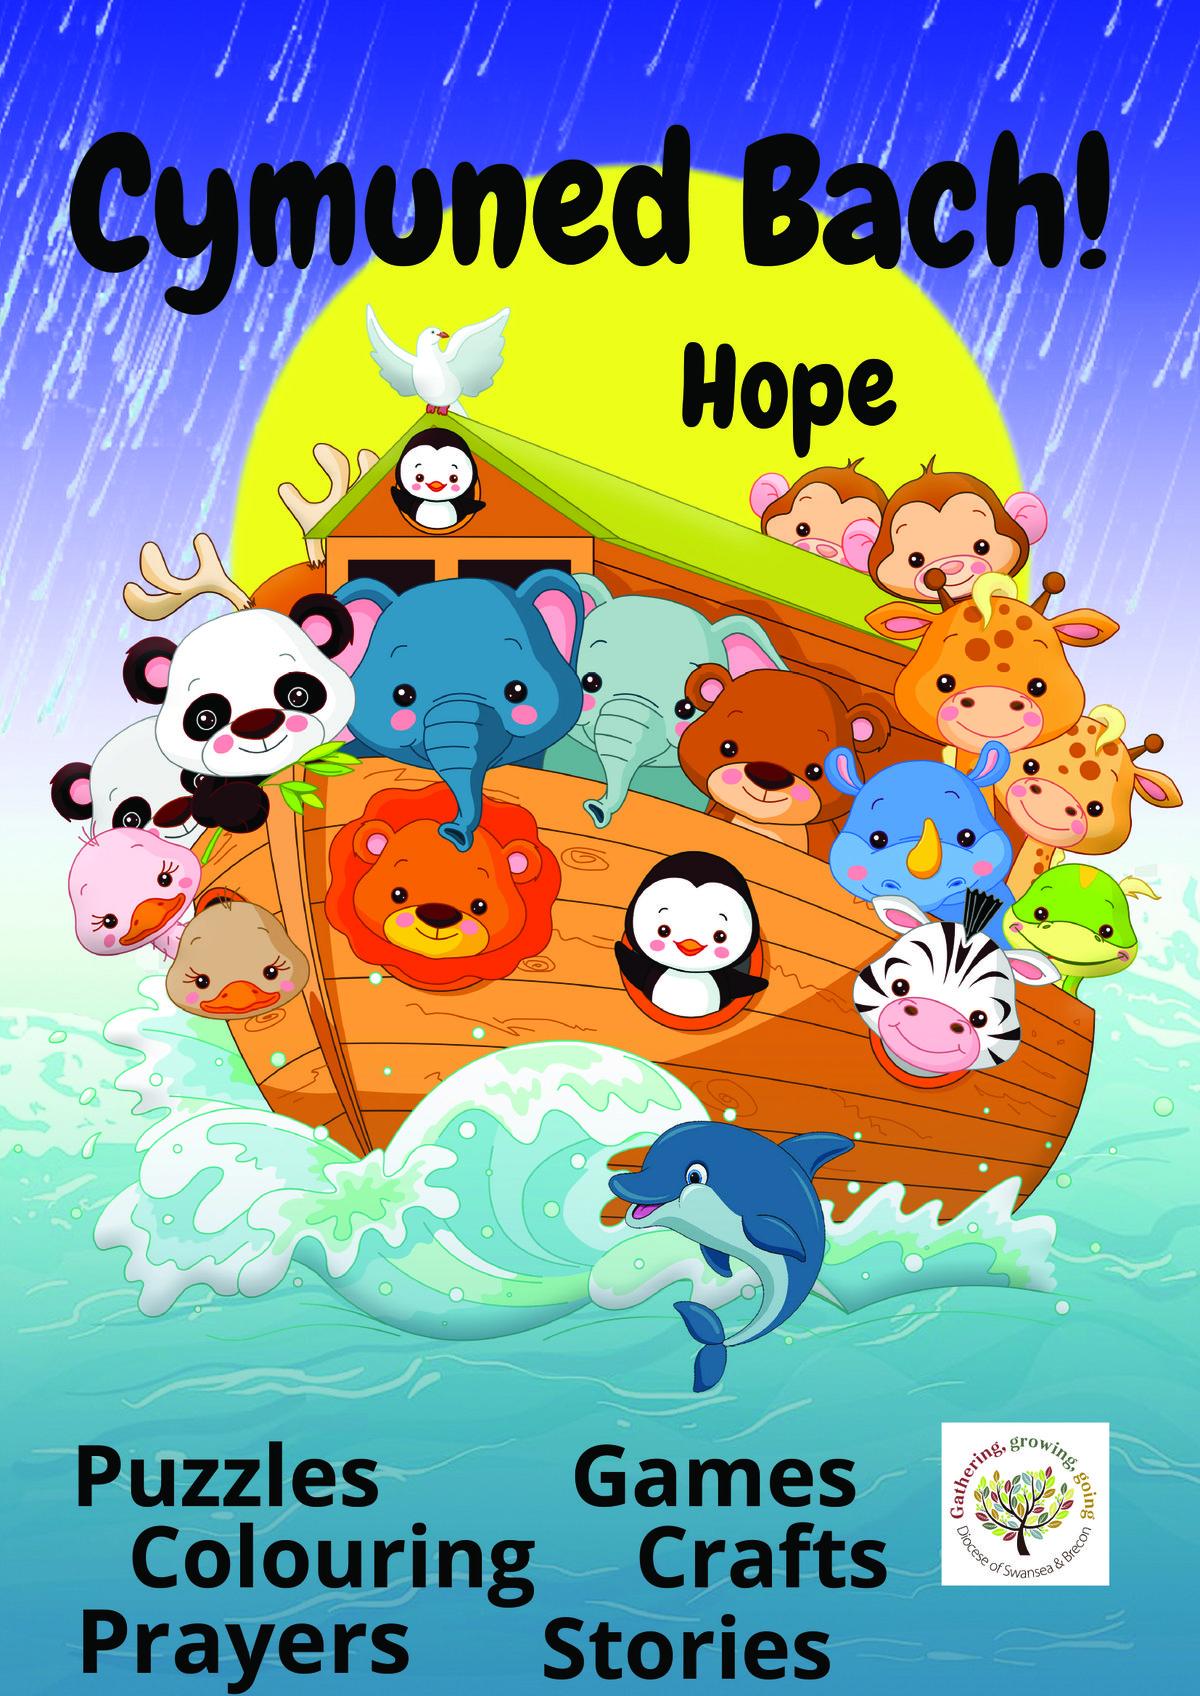 Hope-1.jpg